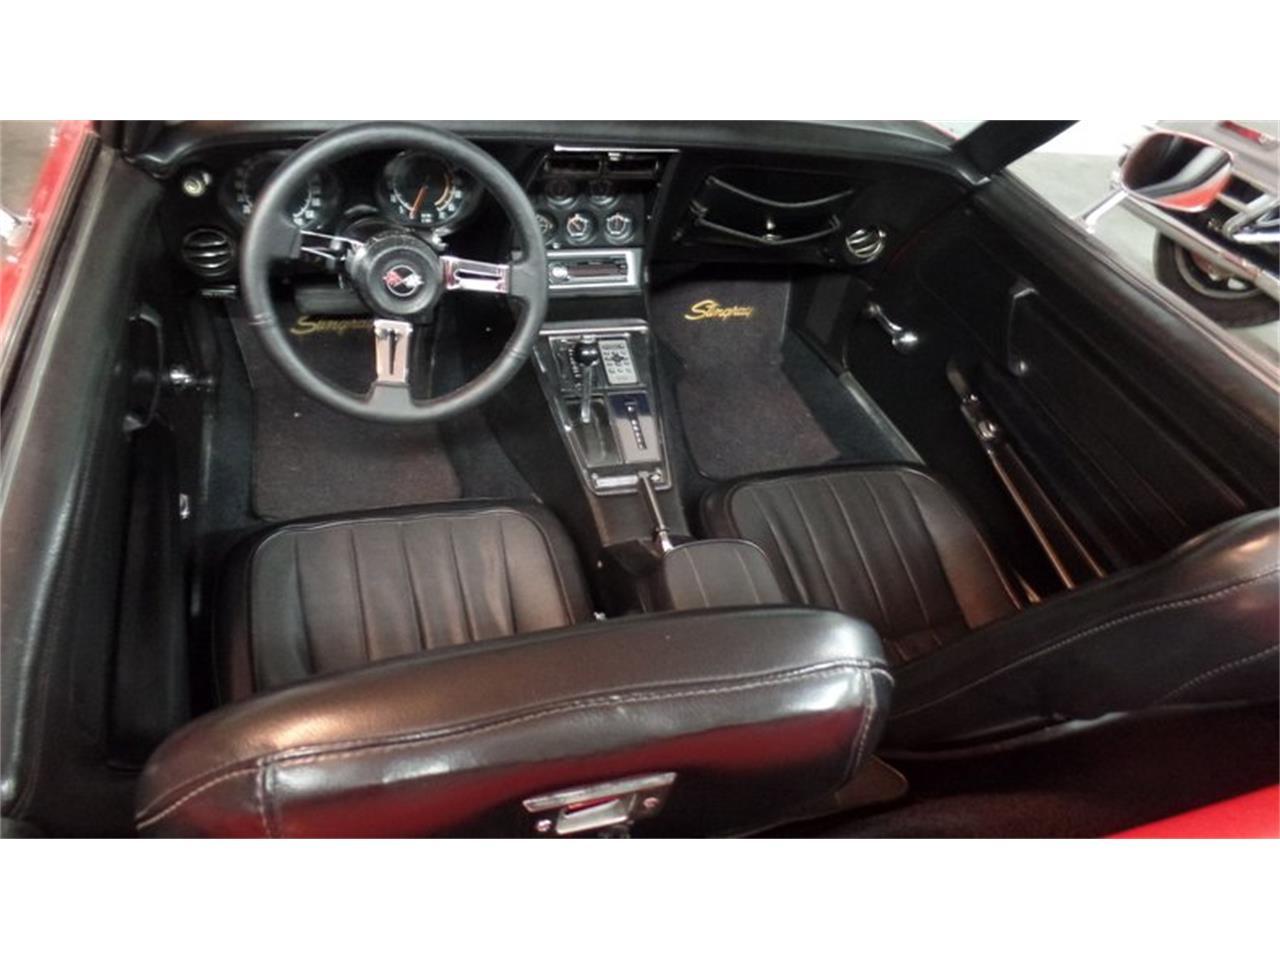 1972 Chevrolet Corvette (CC-1293374) for sale in Punta Gorda, Florida